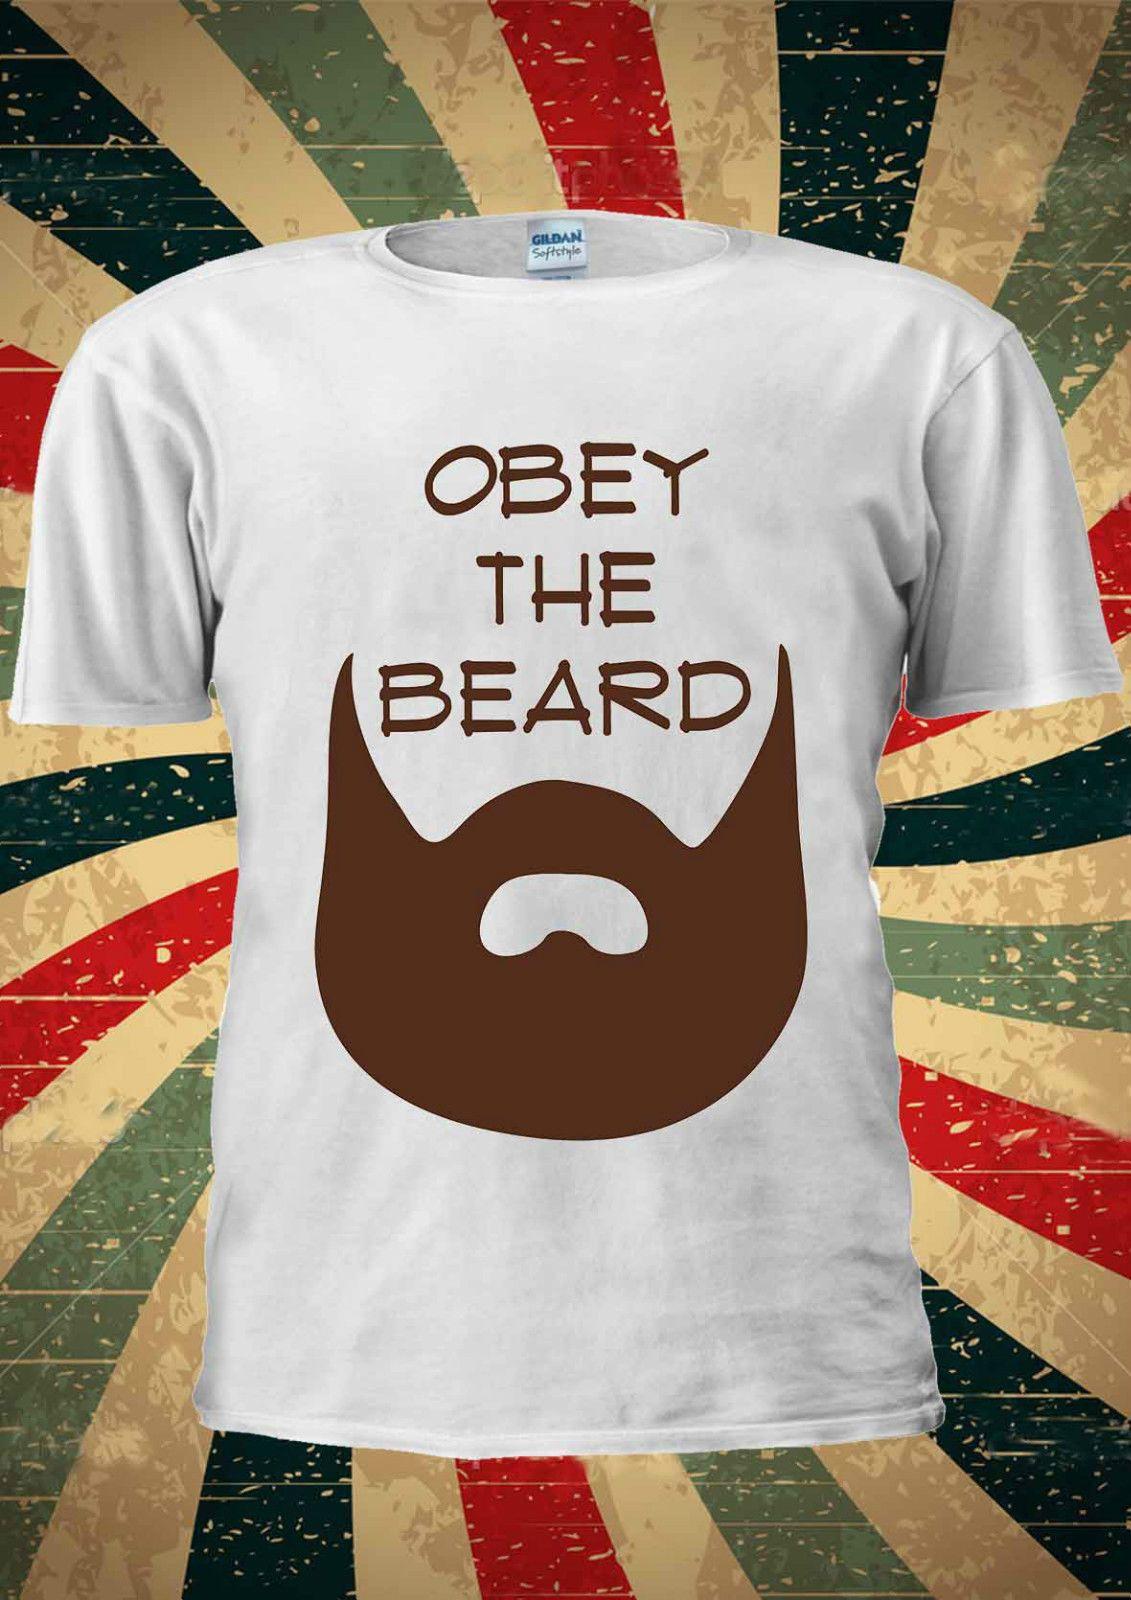 df3ff59a8a0e37 Obey The Beard Funny Moustache T Shirt Vest Top Men Women Unisex 2031 Gift  Print T Shirt